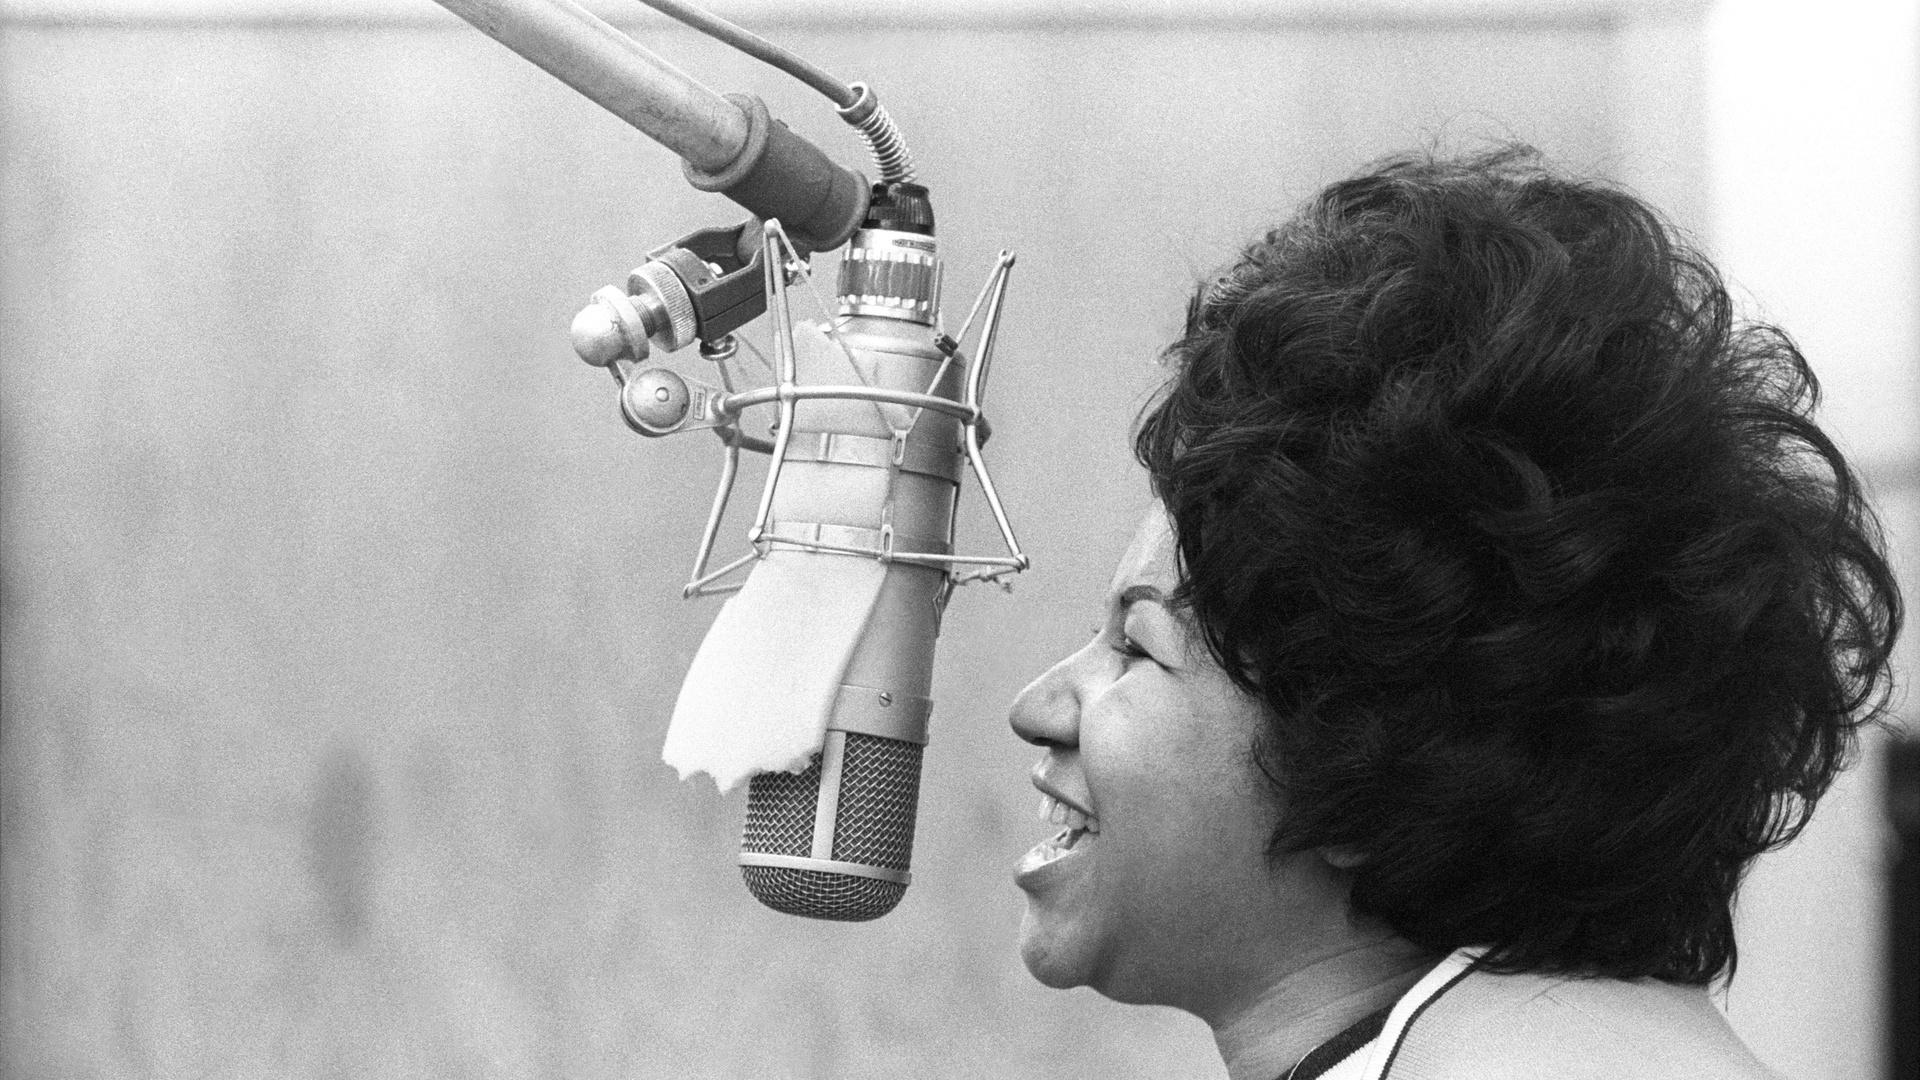 PBS Newshour: Aretha! Queen of Soul